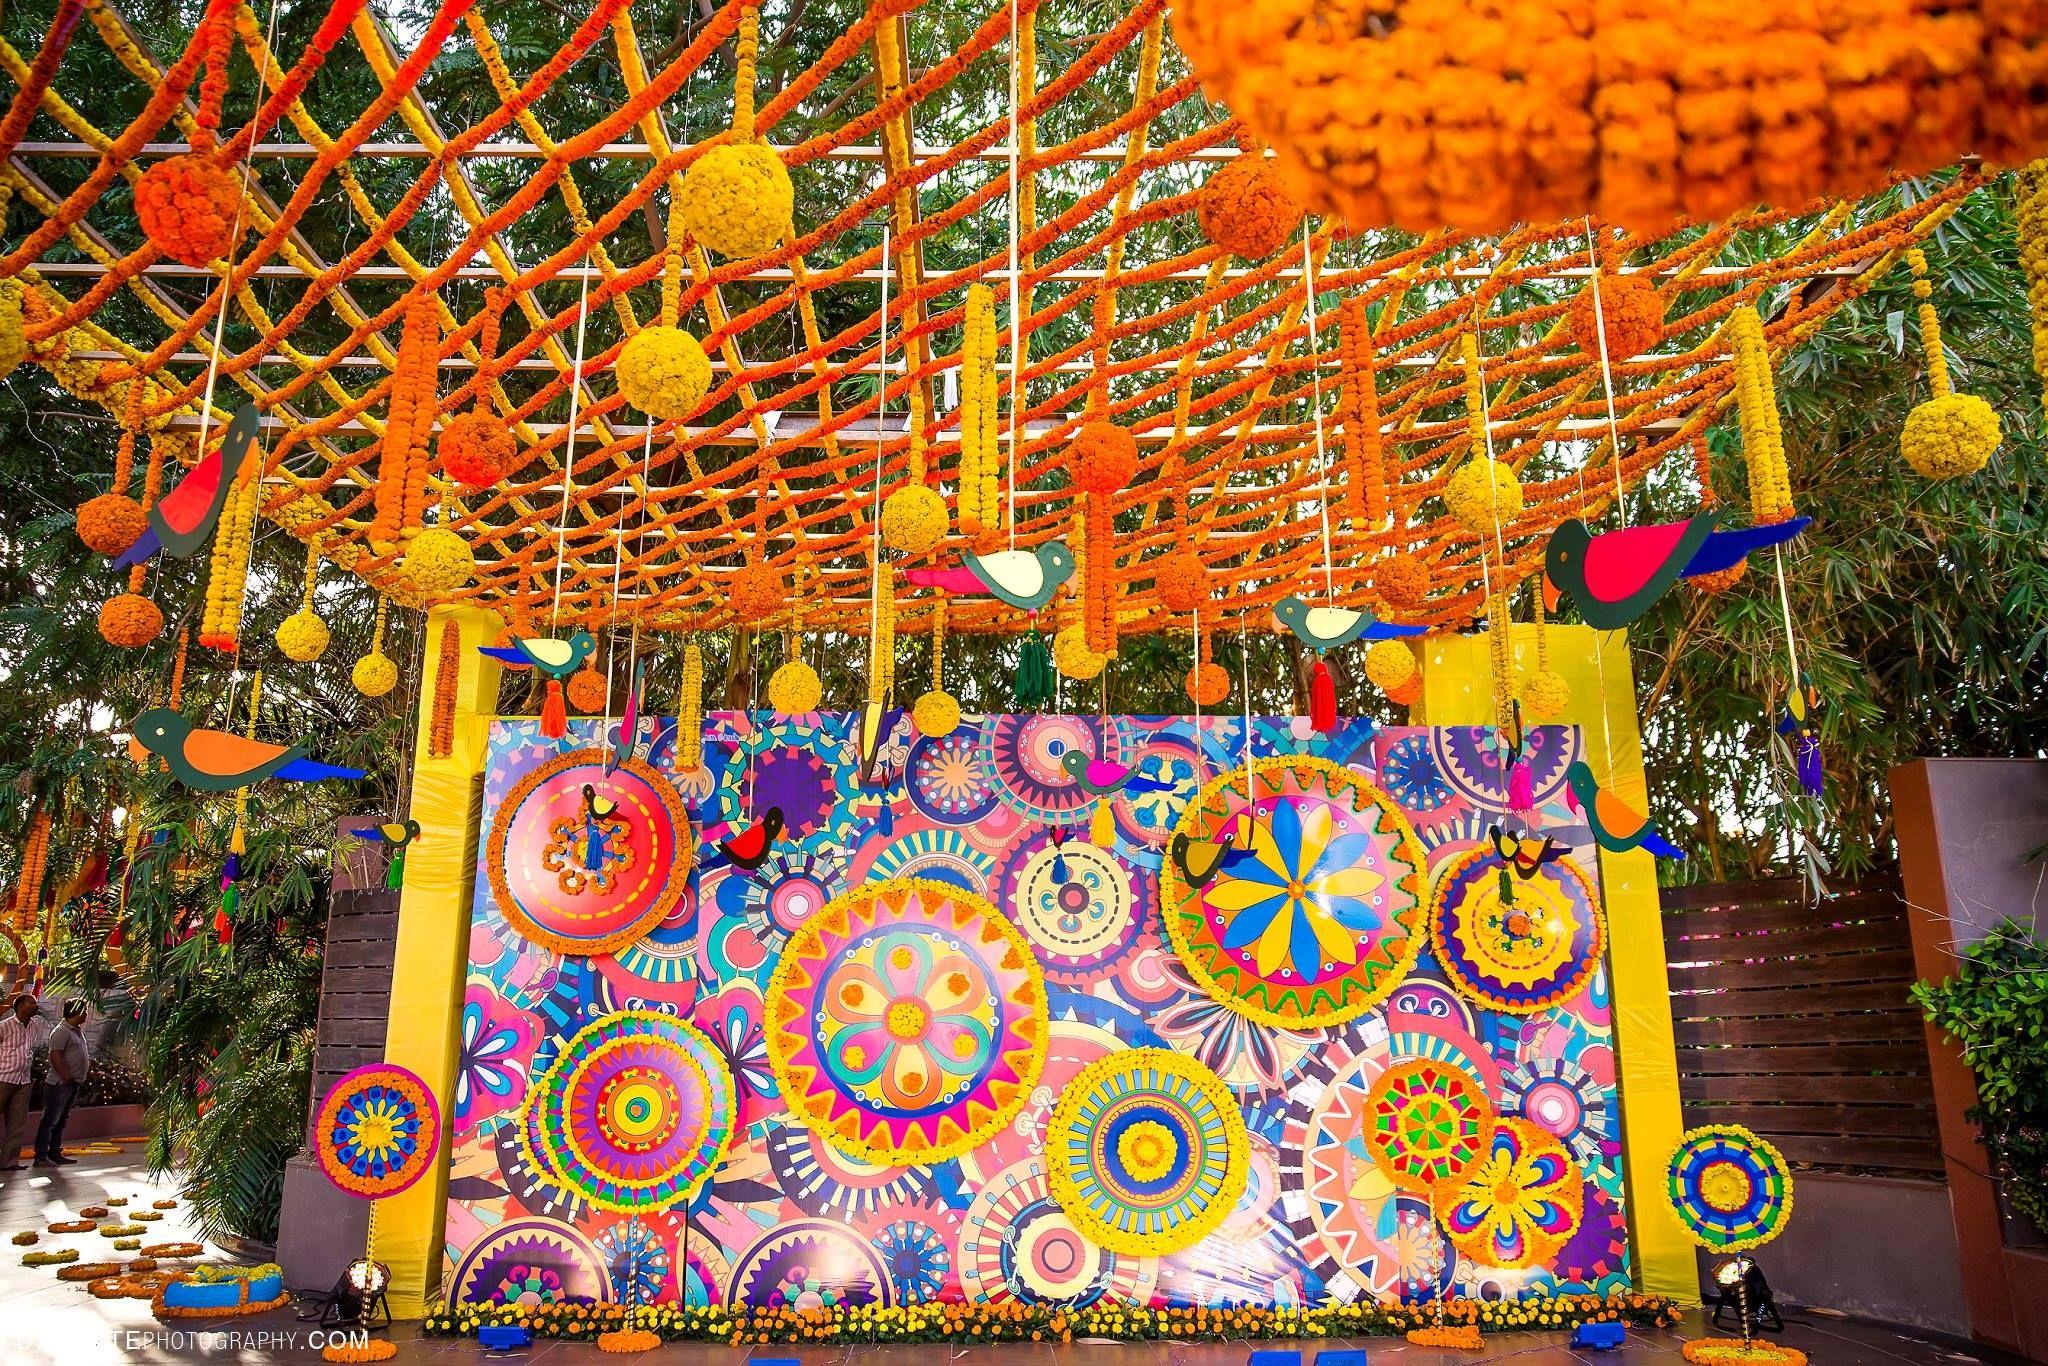 Mehndi Backdrop Diy : Vibrant colors backdrop entry photobooth at the mehndi function